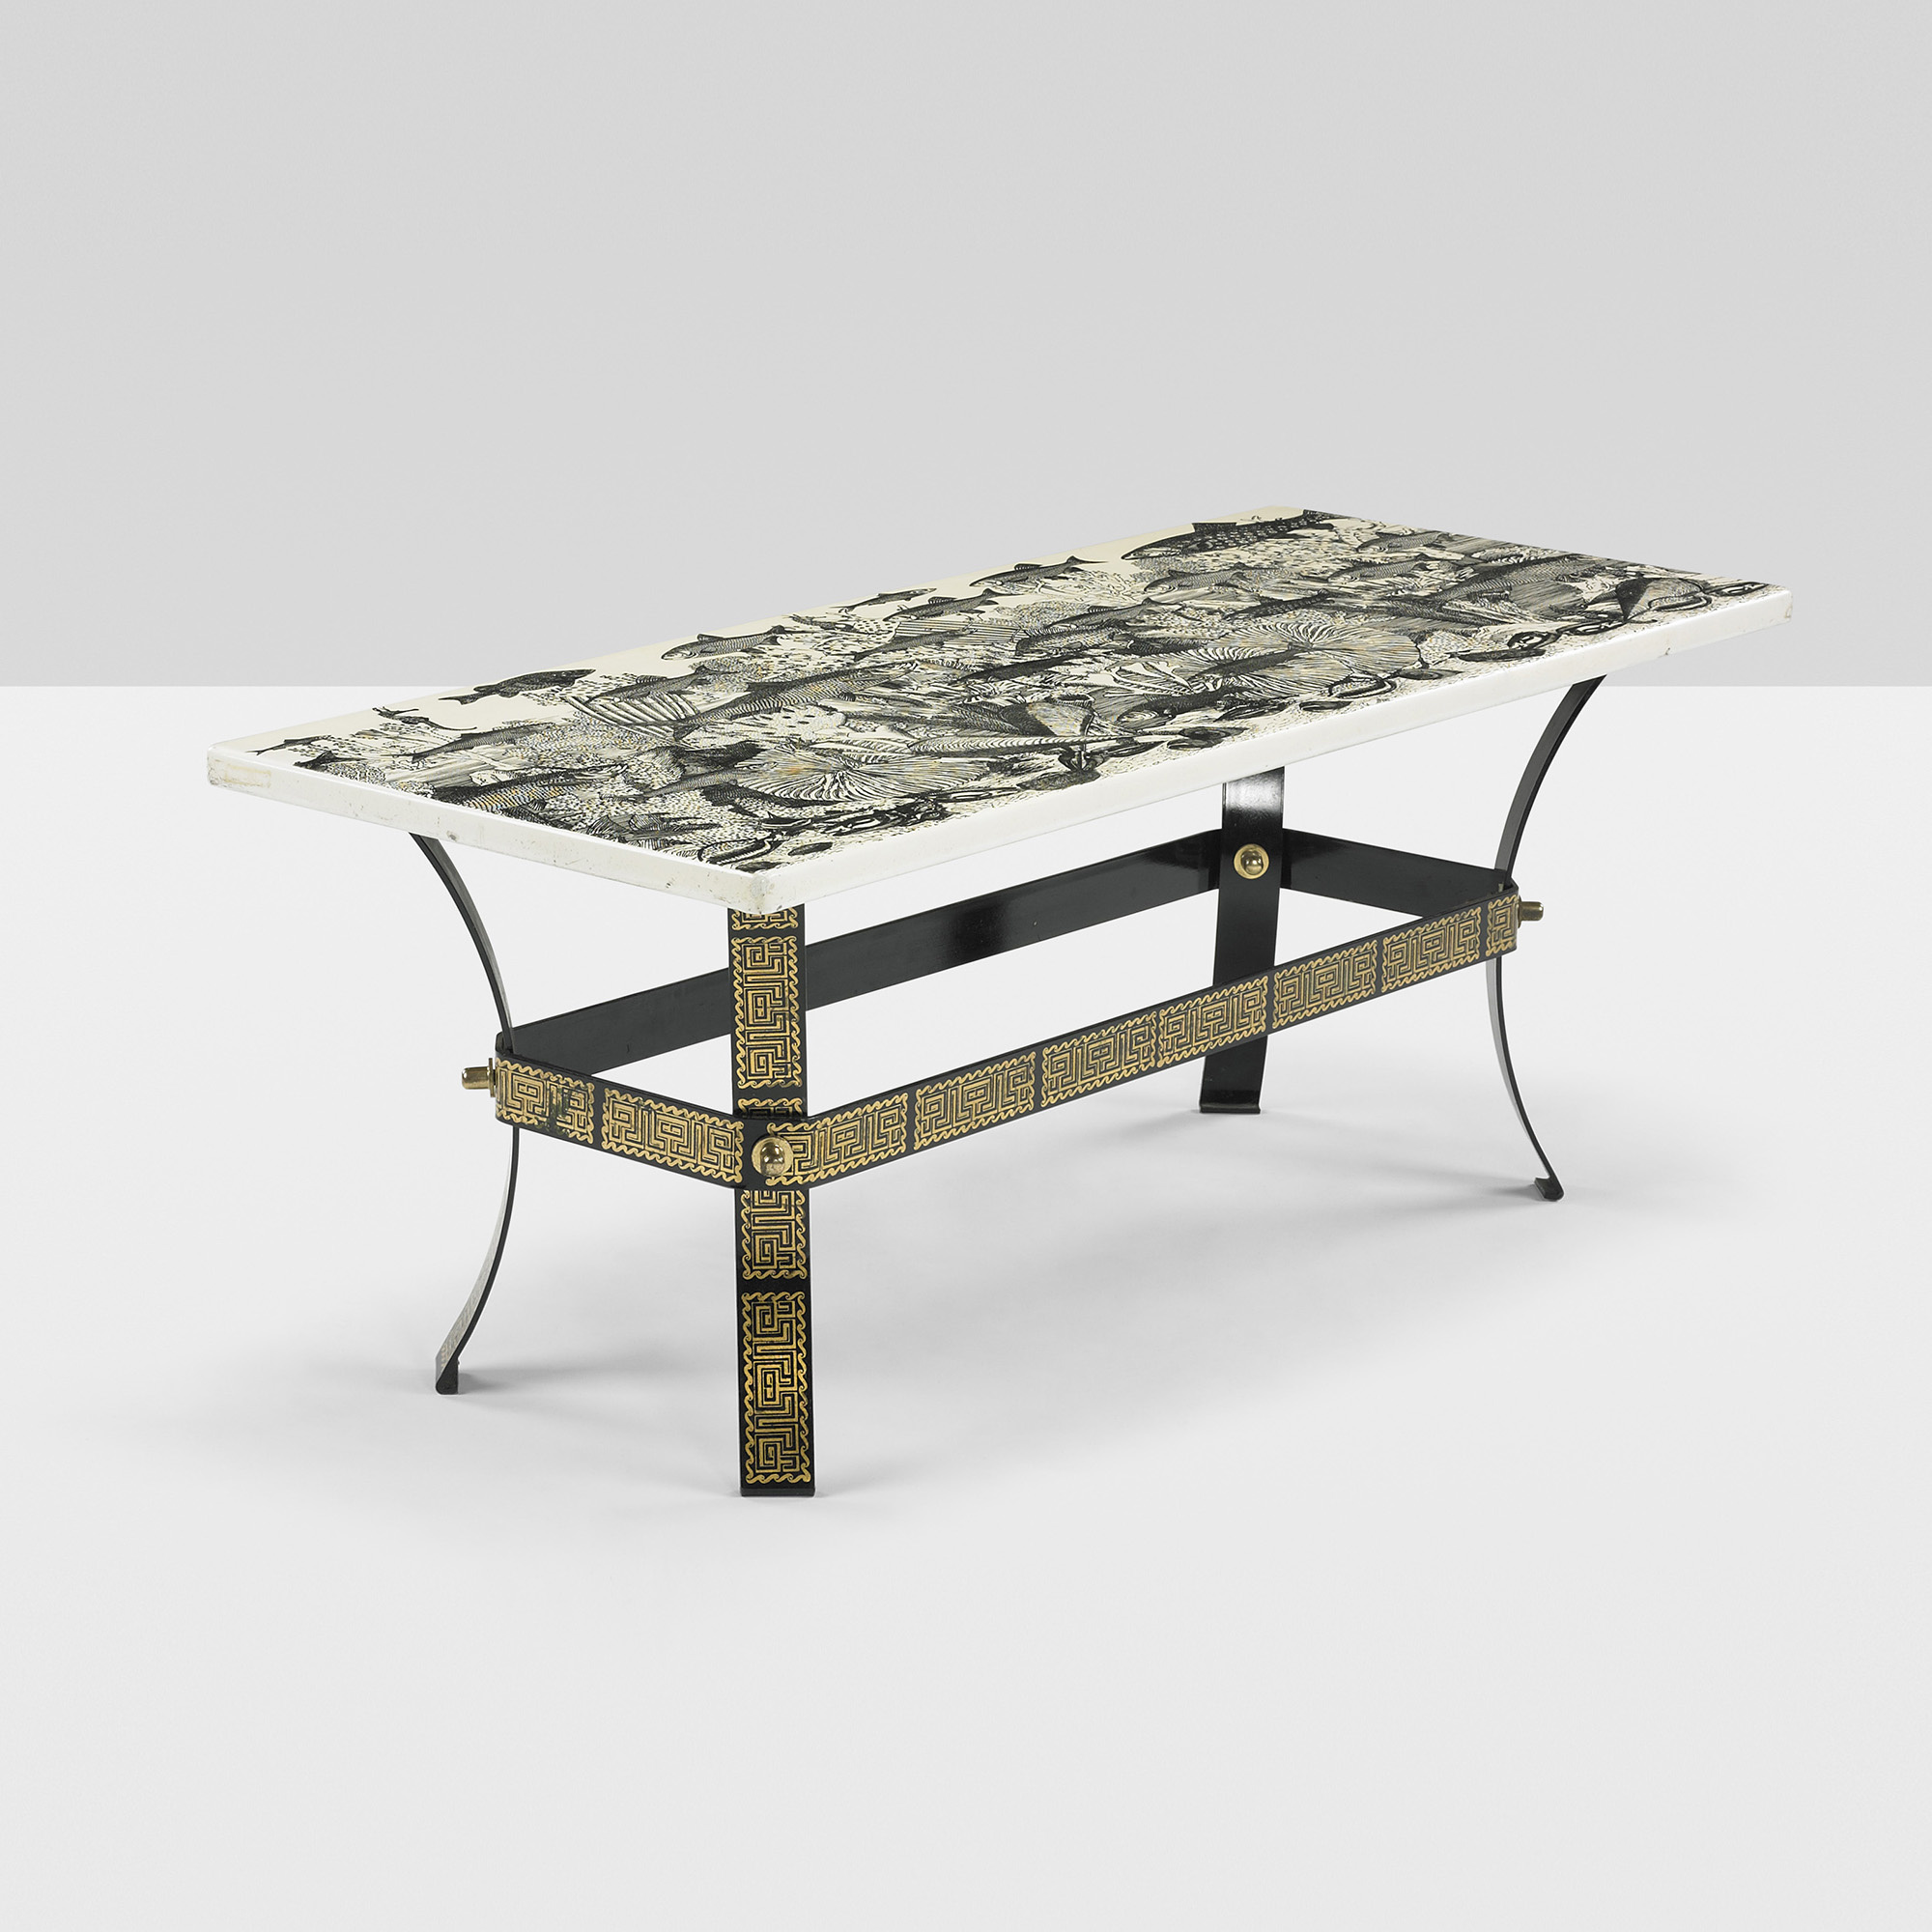 386: Piero Fornasetti / Fondo Marino Coffee Table (1 Of 6)